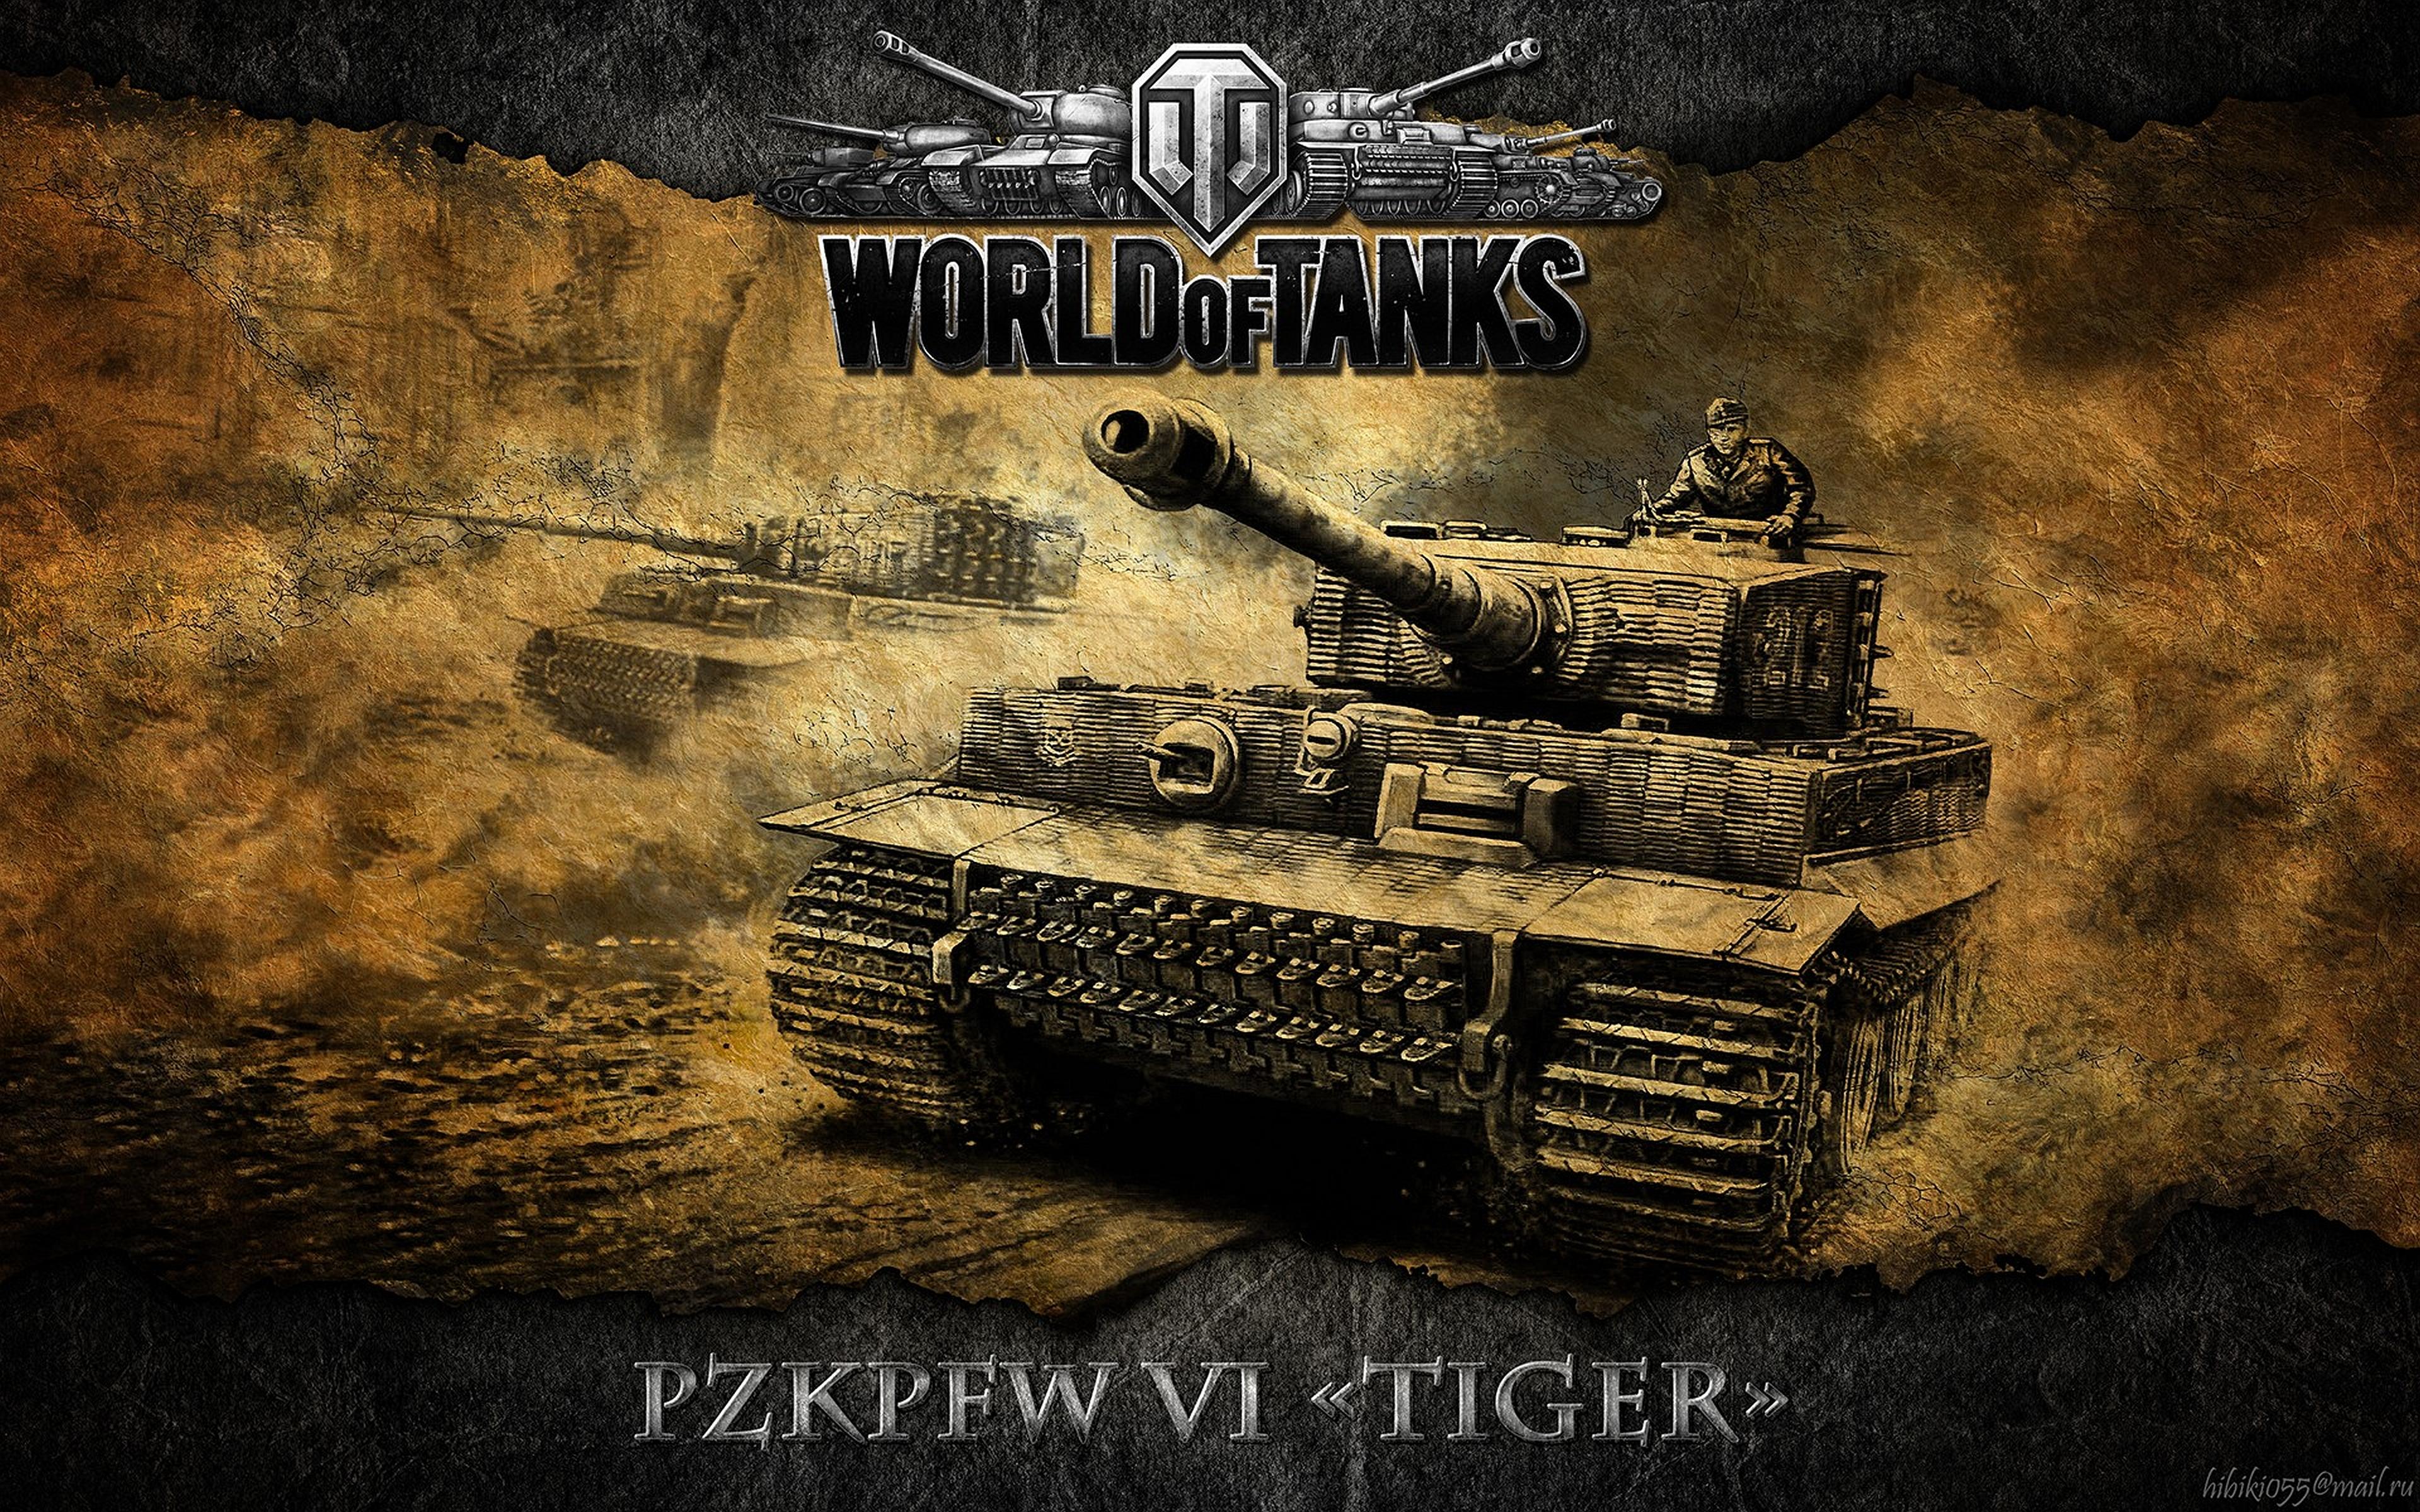 World of tanks the PZKPFW VI TIGER 1 Computer Wallpapers, Desktop ...: wall.alphacoders.com/big.php?i=329857